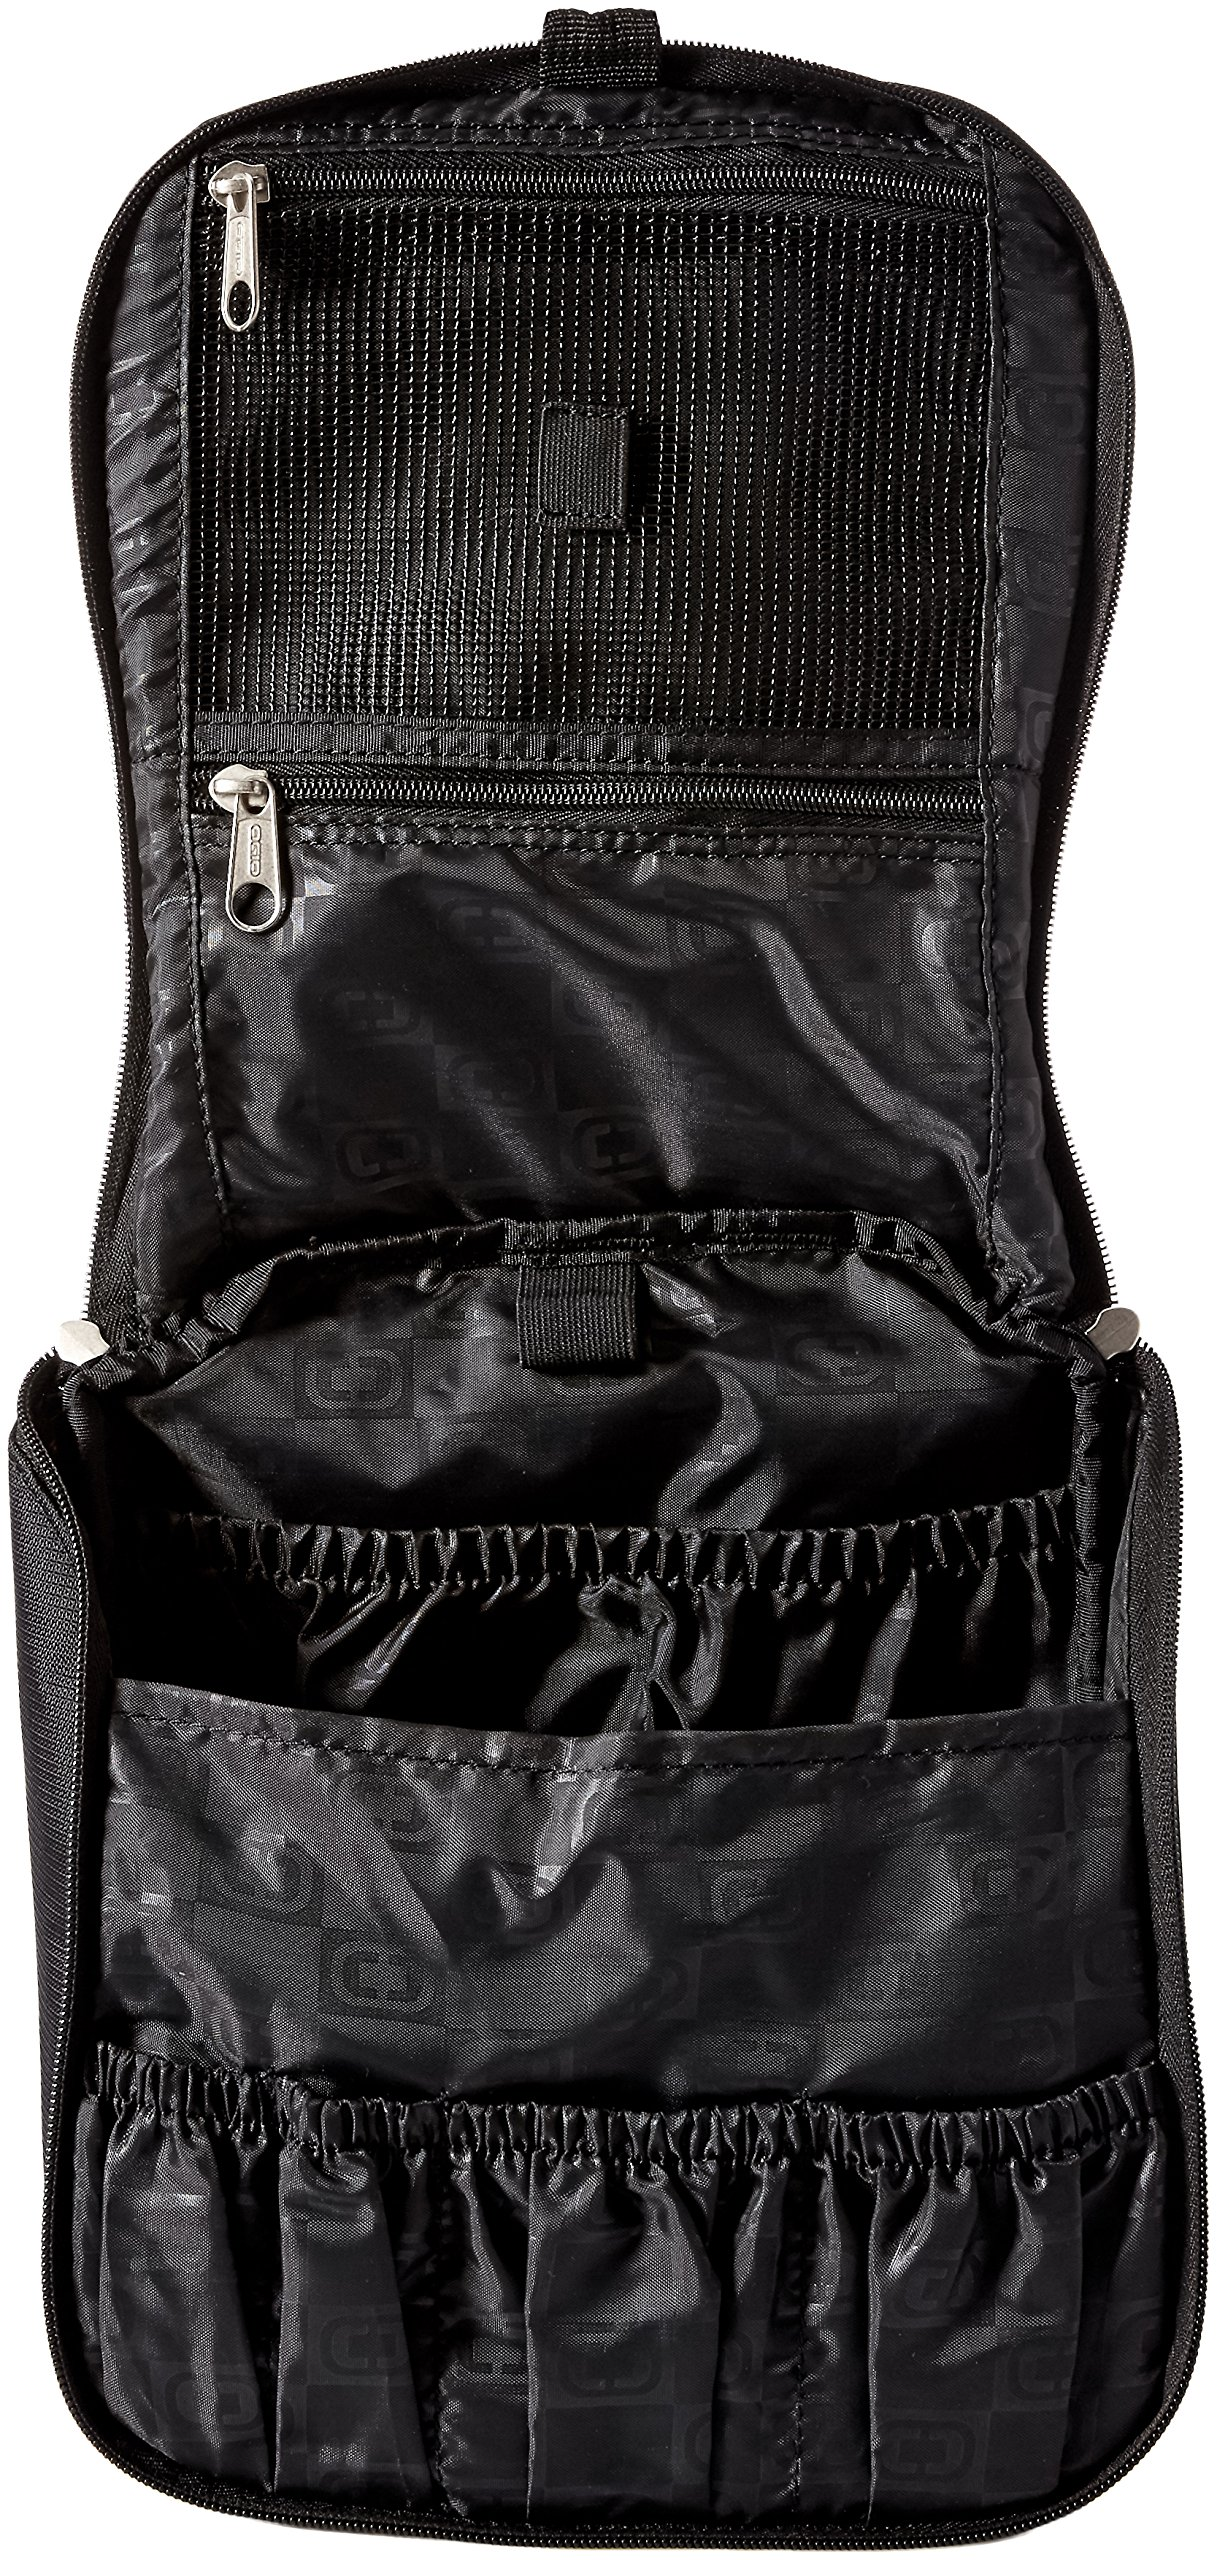 91pGxOf48eL - OGIO Doppler Travel Kit, Black, 24 cm-4 Litre